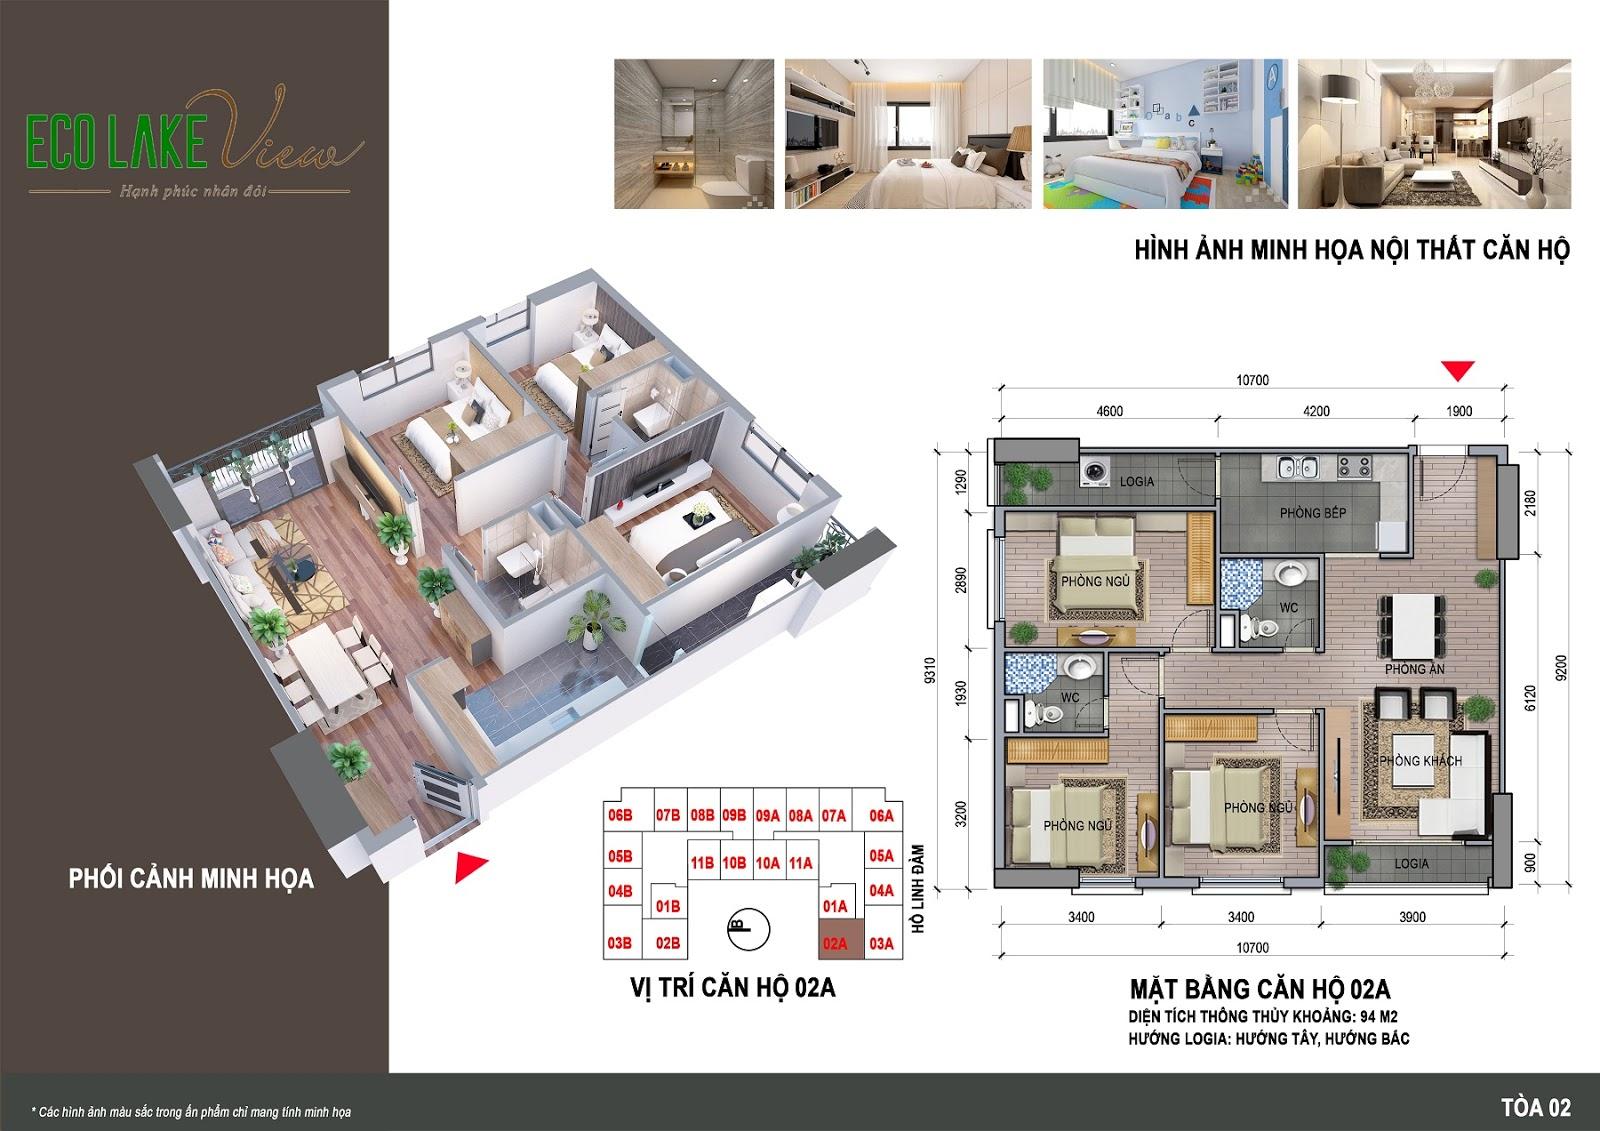 Thiết kế căn hộ 02A - 94m - HH02 Eco Lake View